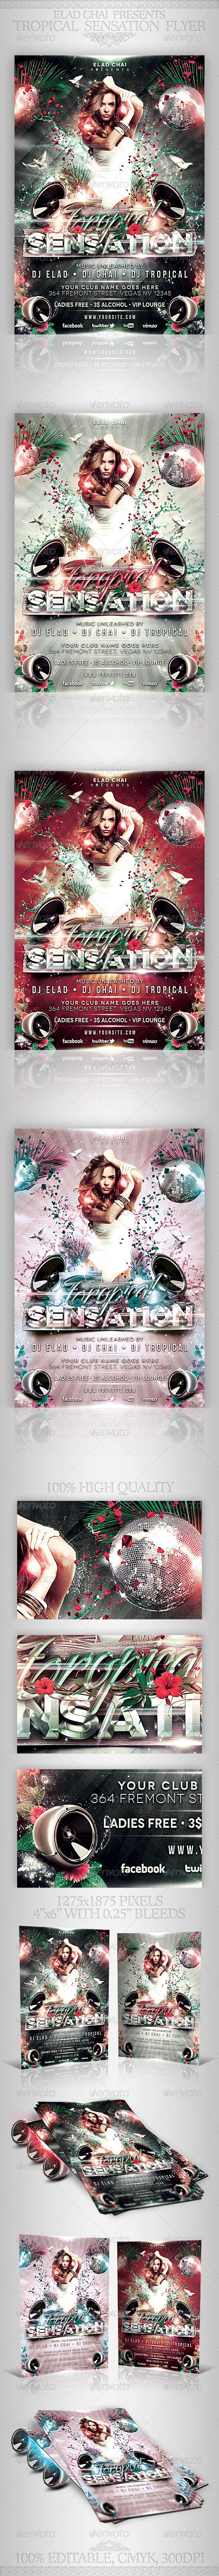 Tropical Sensation Party Flyer Template - Clubs & Parties Events